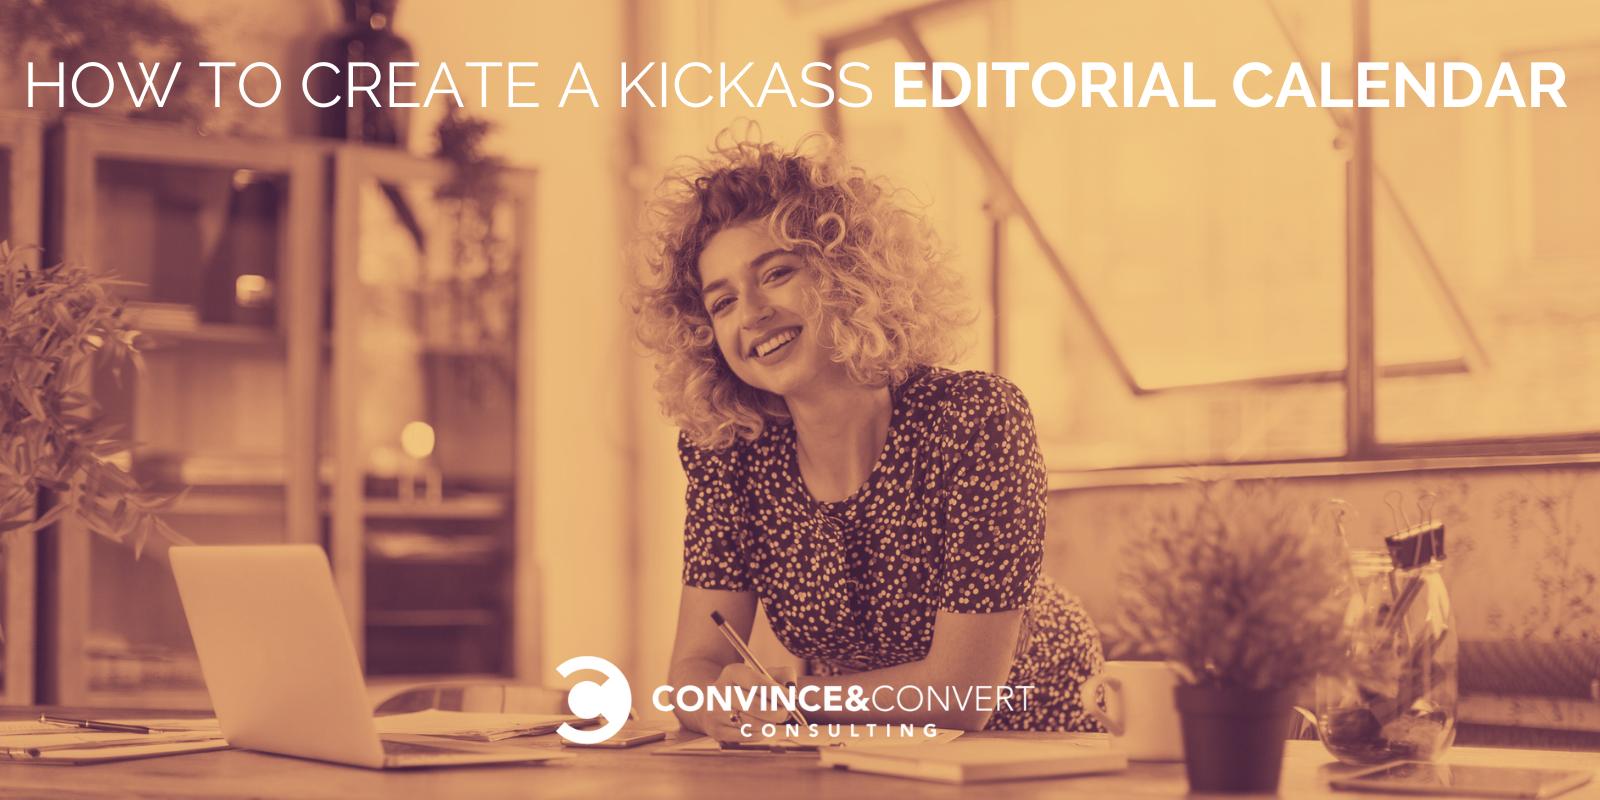 How to Create a Kickass Editorial Calendar